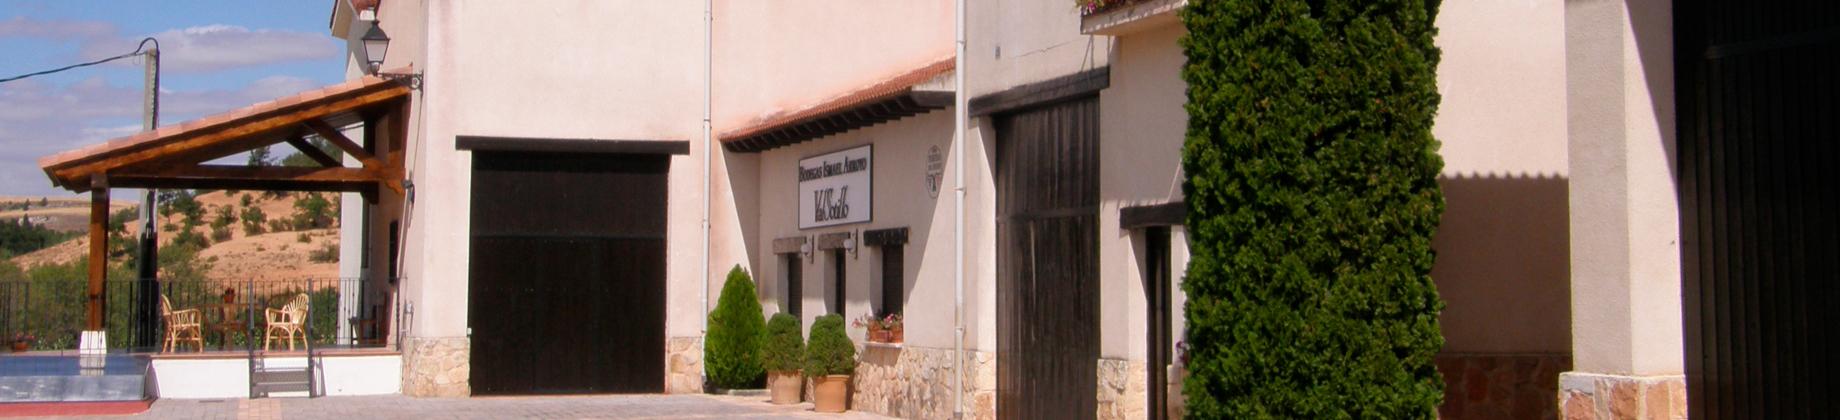 Bodegas Ismael Arroyo-Valsotillo